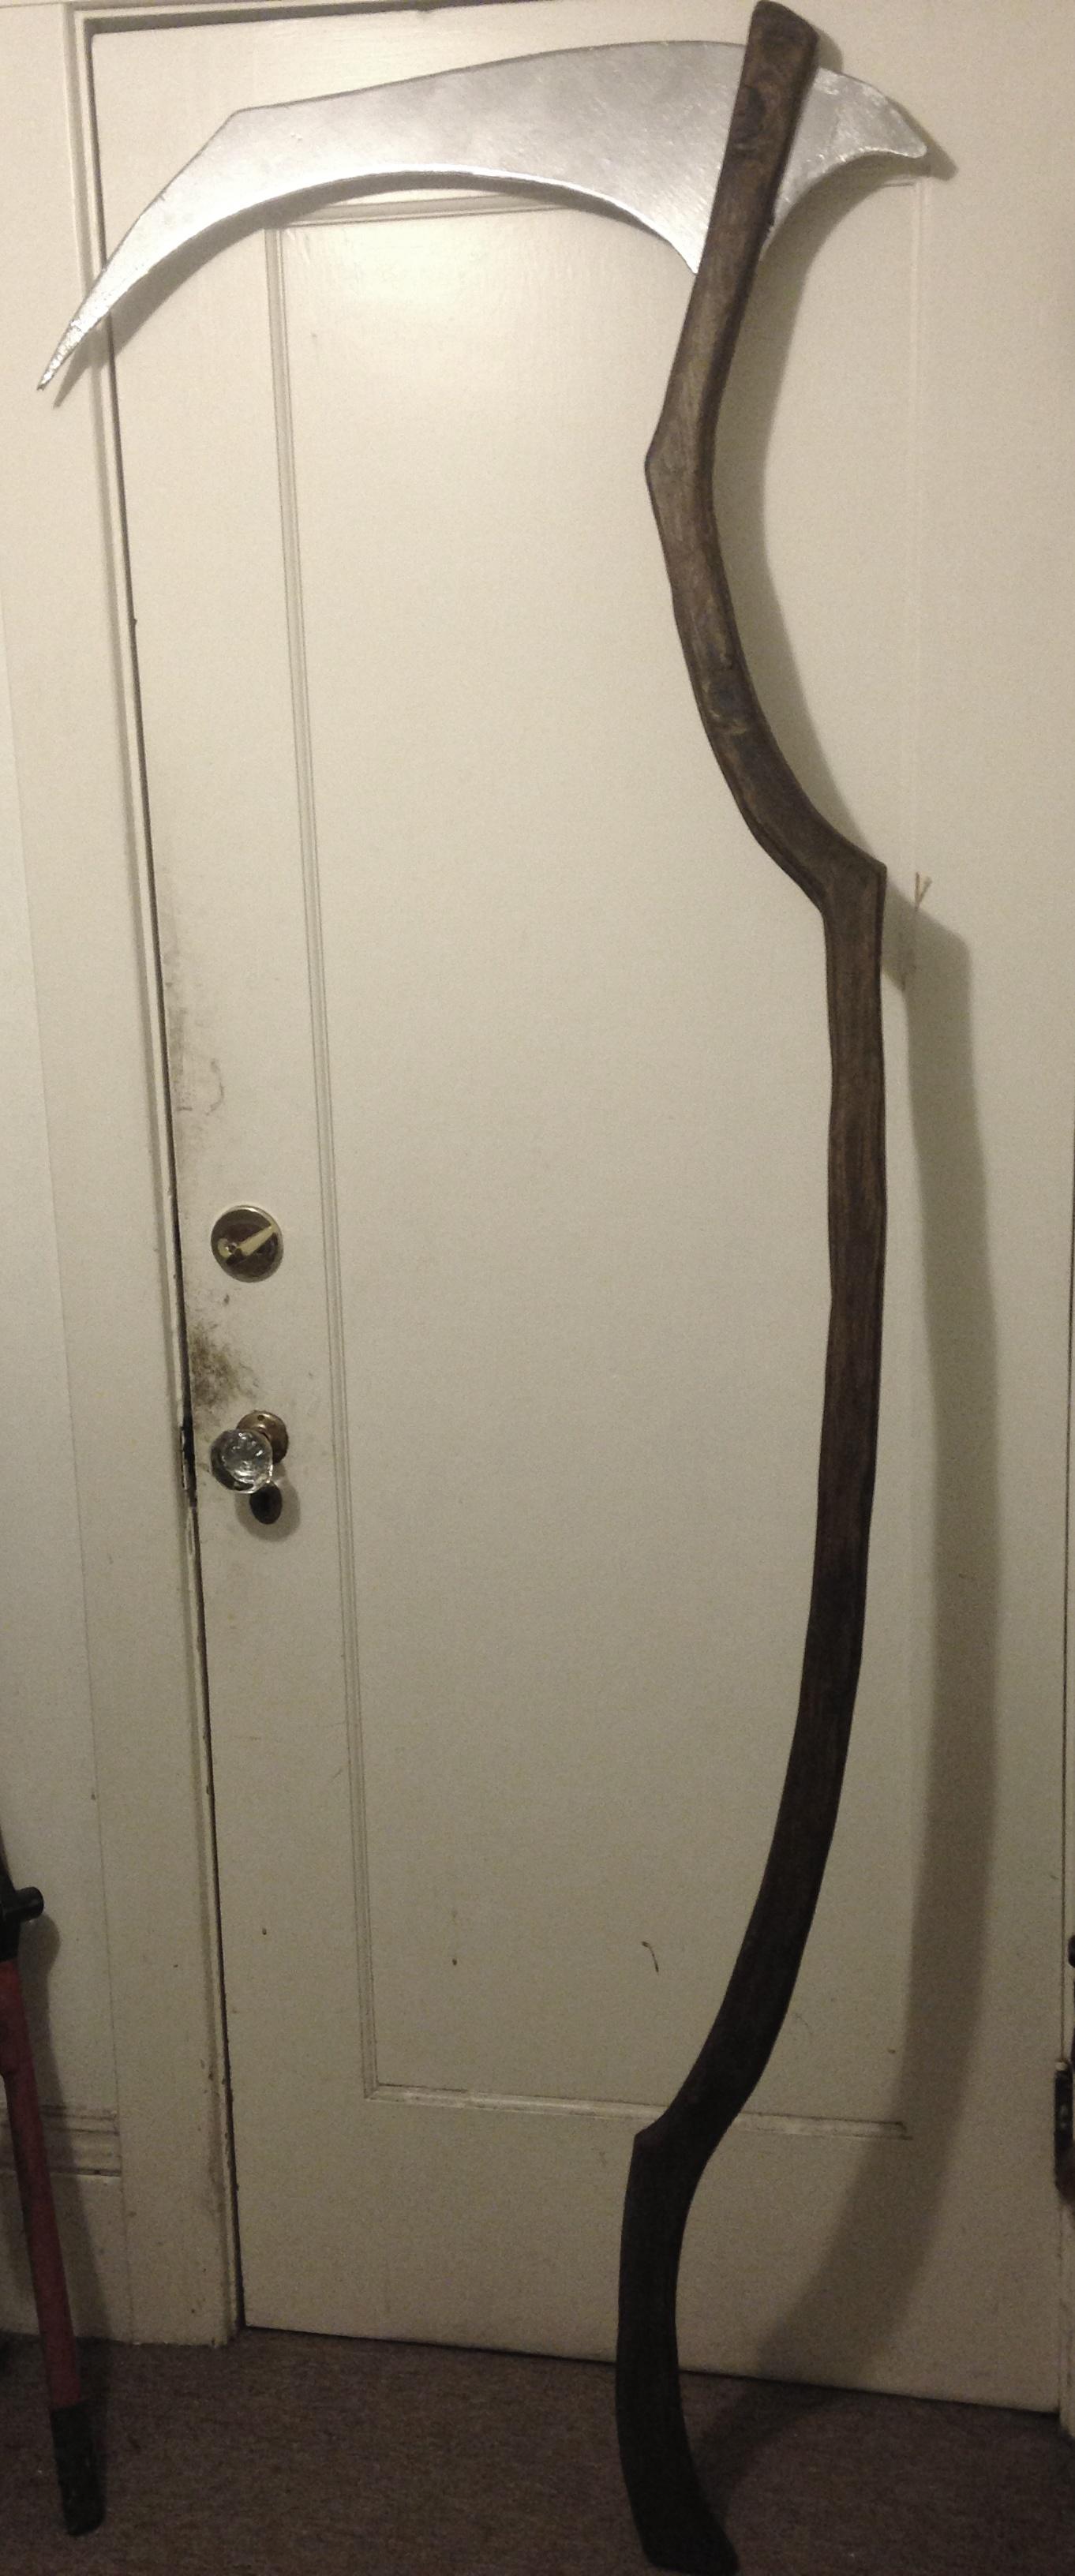 Prop scythe